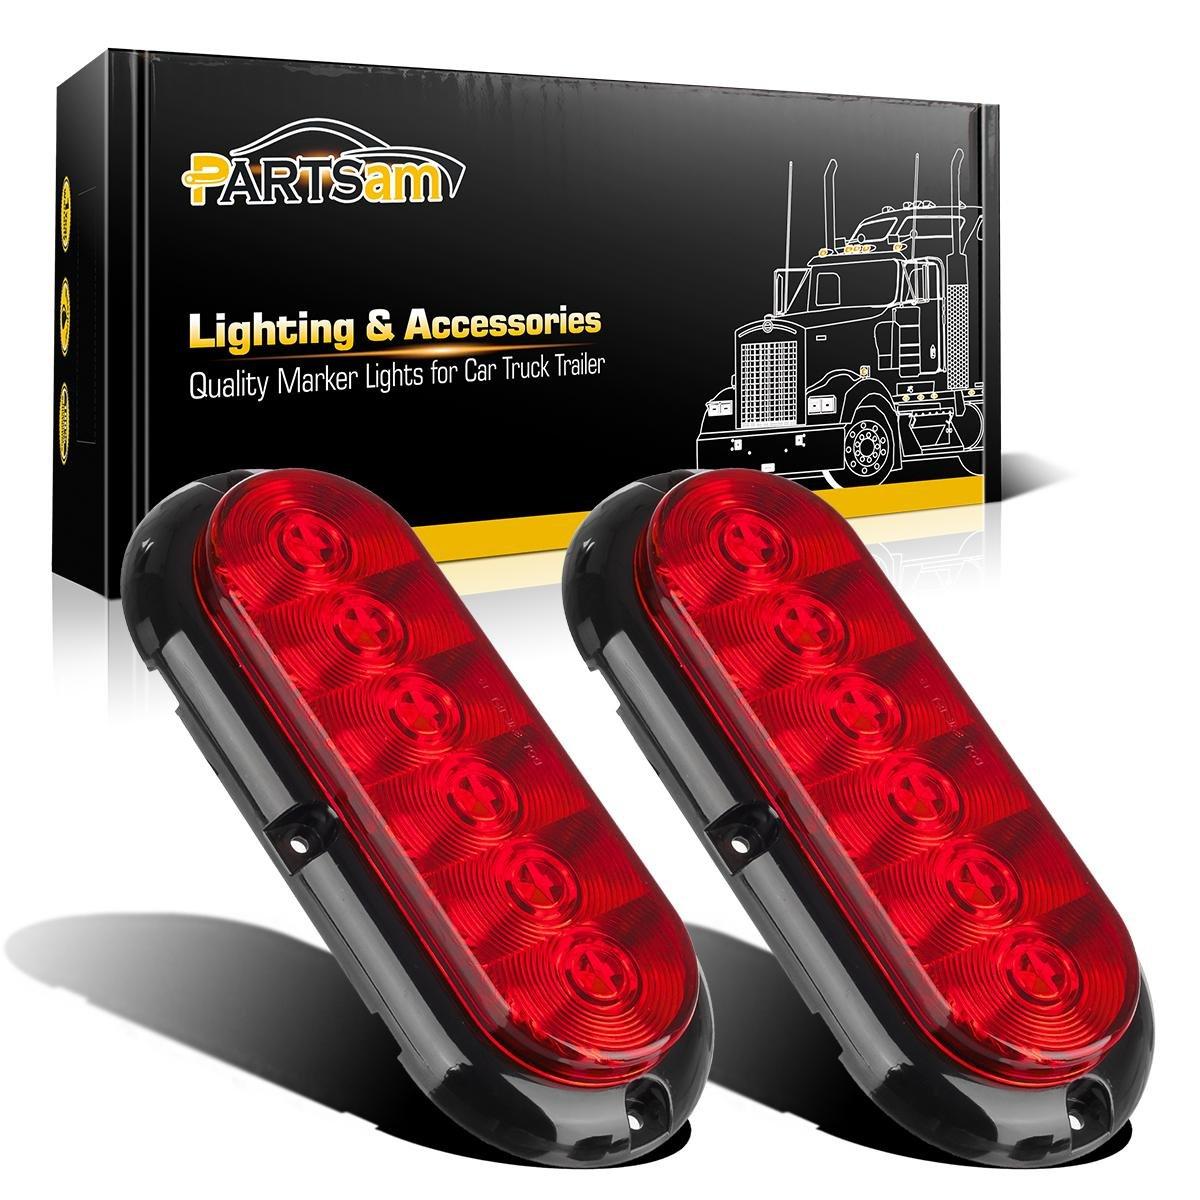 "Partsam 2PCS Trailer Truck Boat Bus Red LED 6"" Inch Oval Stop Turn Tail Brake Light DOT Certified Marker Lights Sealed Surface Mount 12V Waterproof for RV Jeep Trucks"